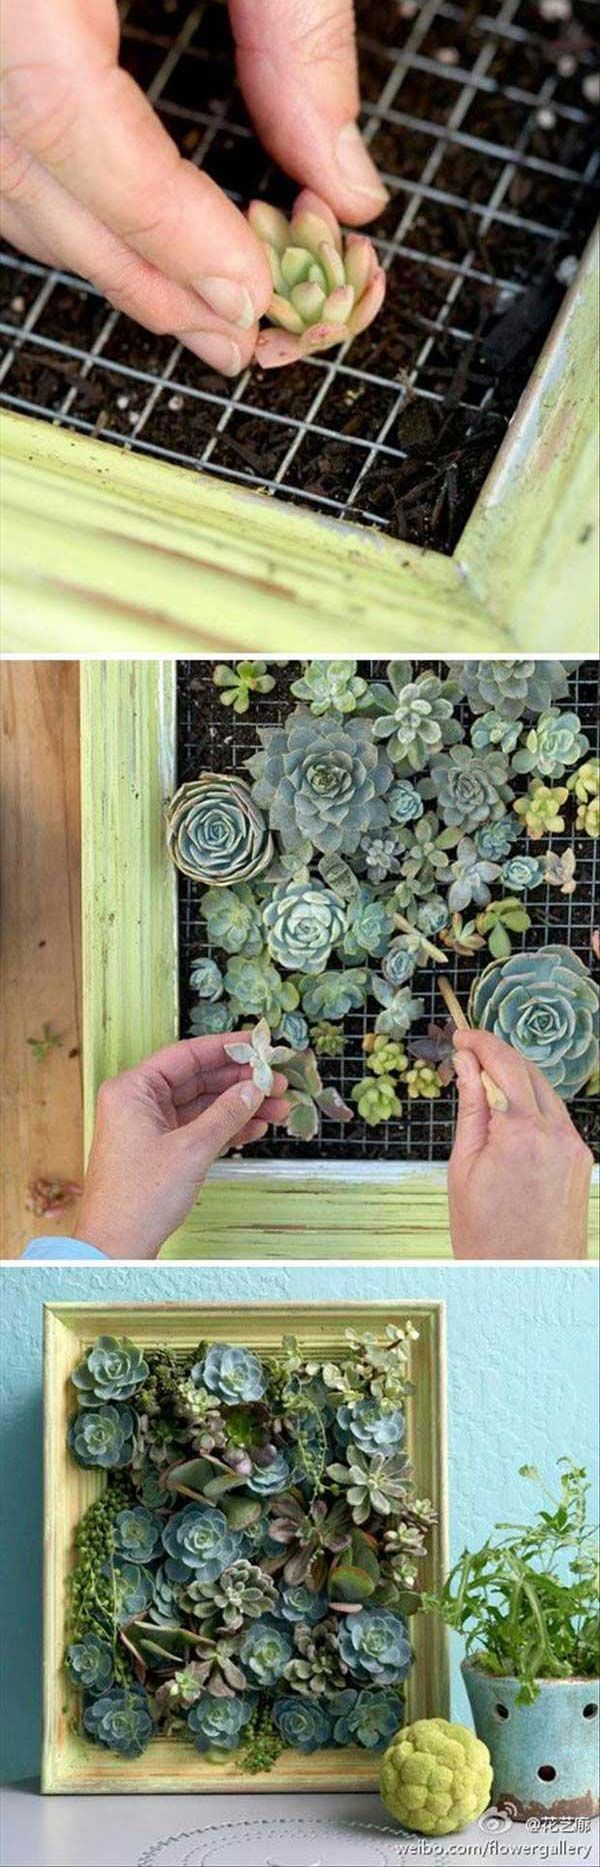 Top 24 fantastische Ideen, um Ihren Indoor-Minigarten zu präsentieren #